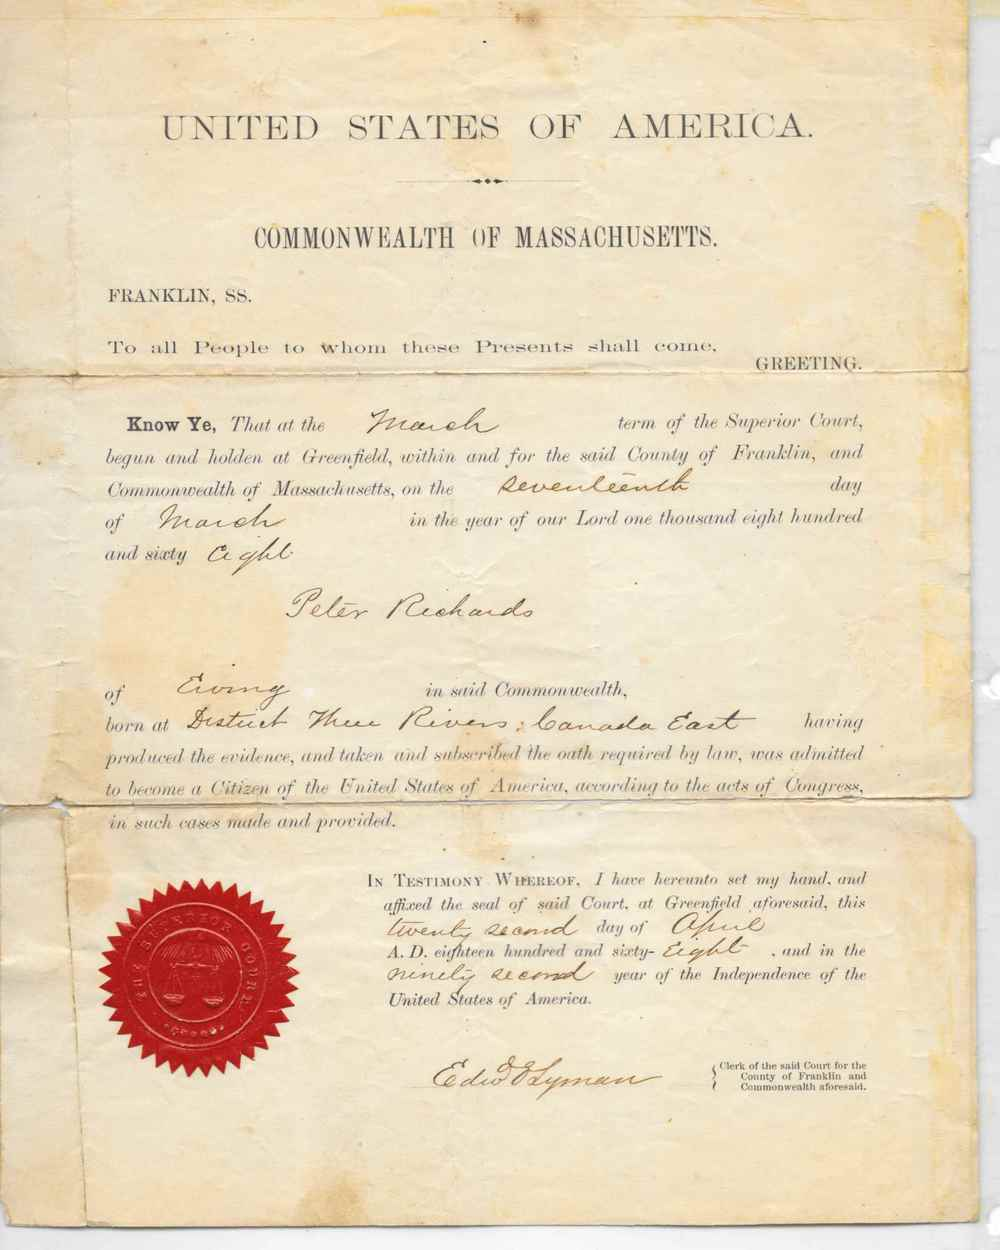 Peter Richards' citizenship.